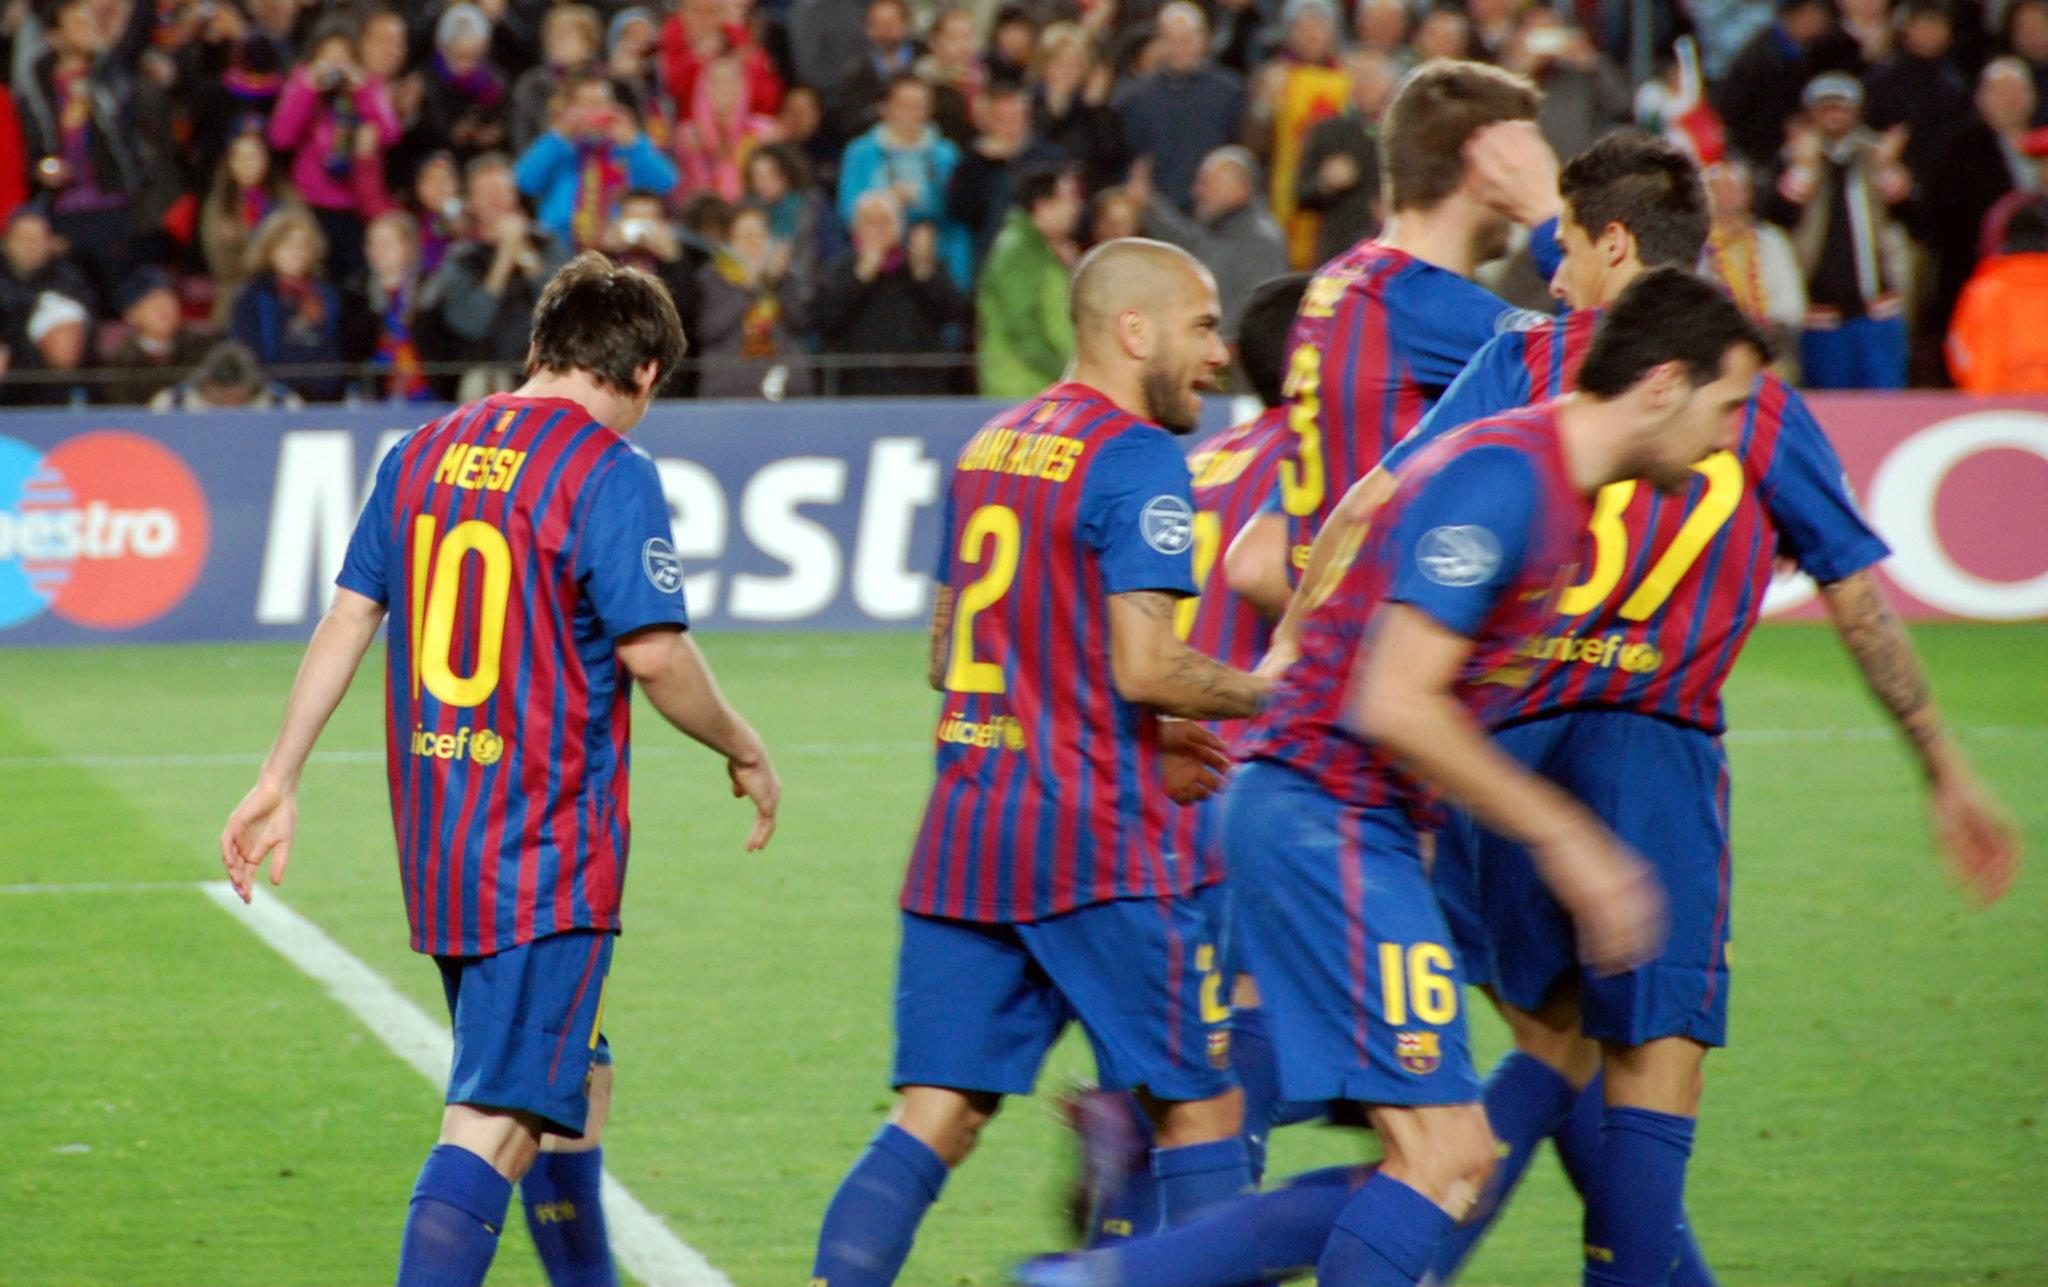 Barcelona Fc: Bayer 04 Leverkusen, 7 Mar 2012 (18